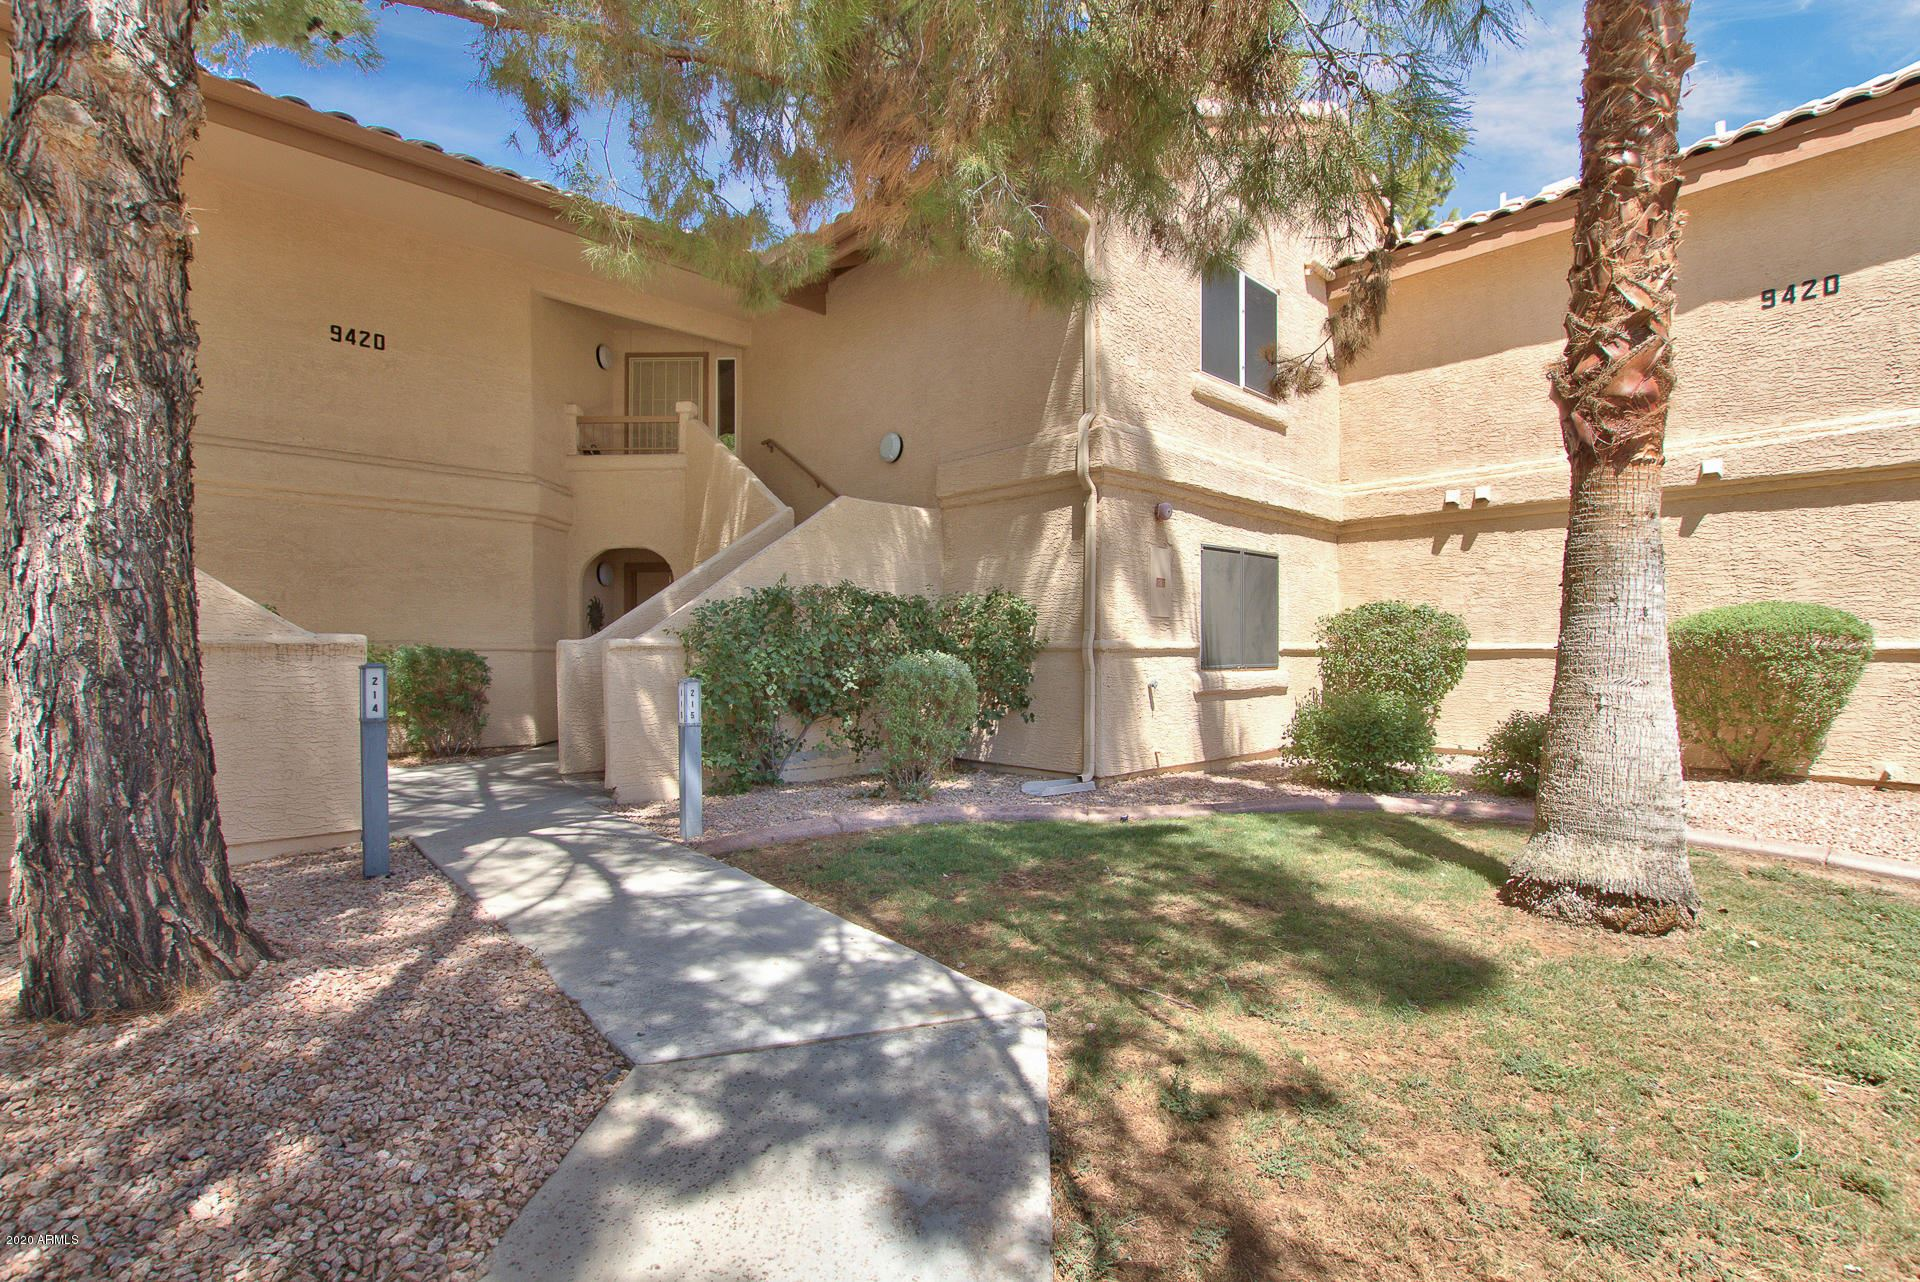 9420 E PURDUE Avenue #215, Scottsdale, AZ 85258 - MLS#: 6128075